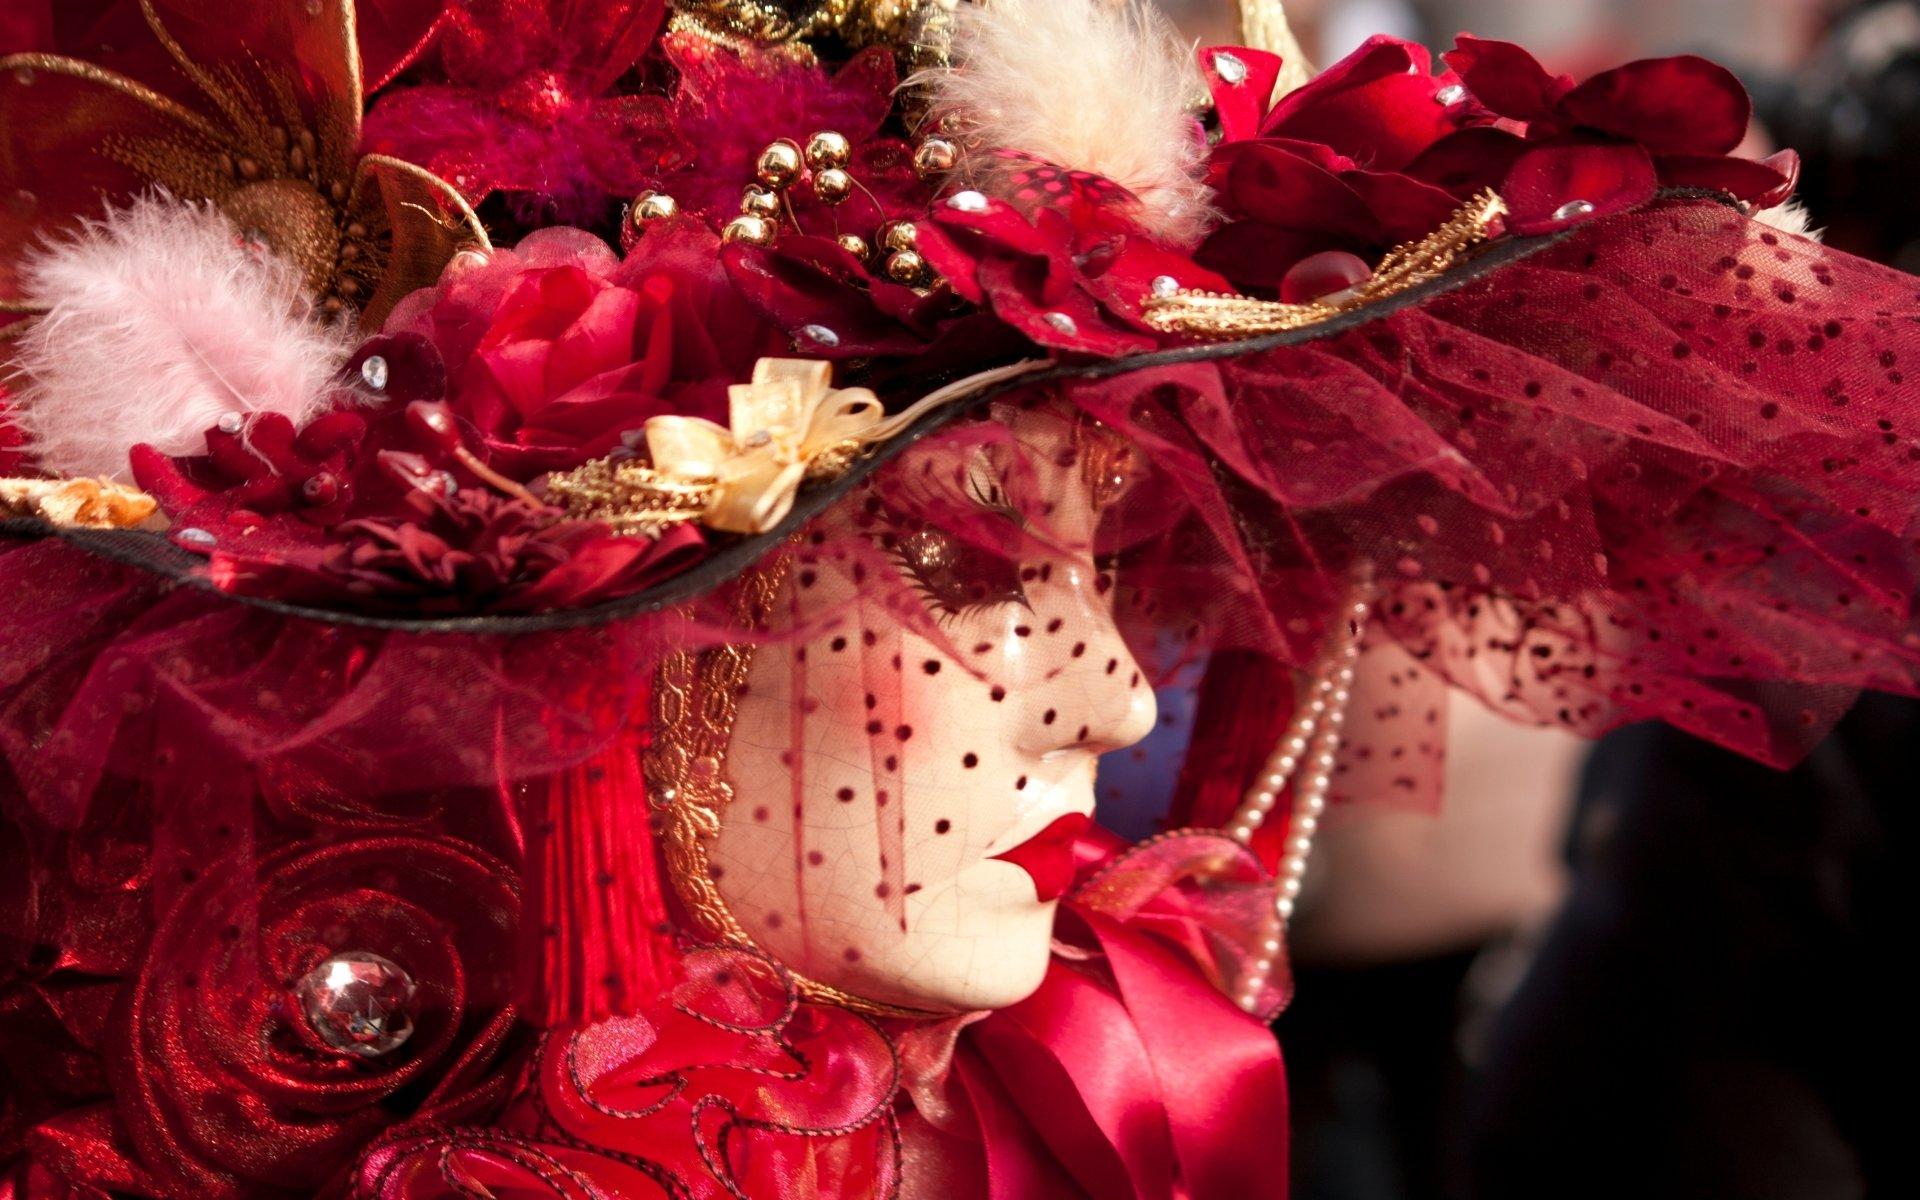 43 Carnaval De Venise Fonds D Ecran Hd Arriere Plans Wallpaper Abyss